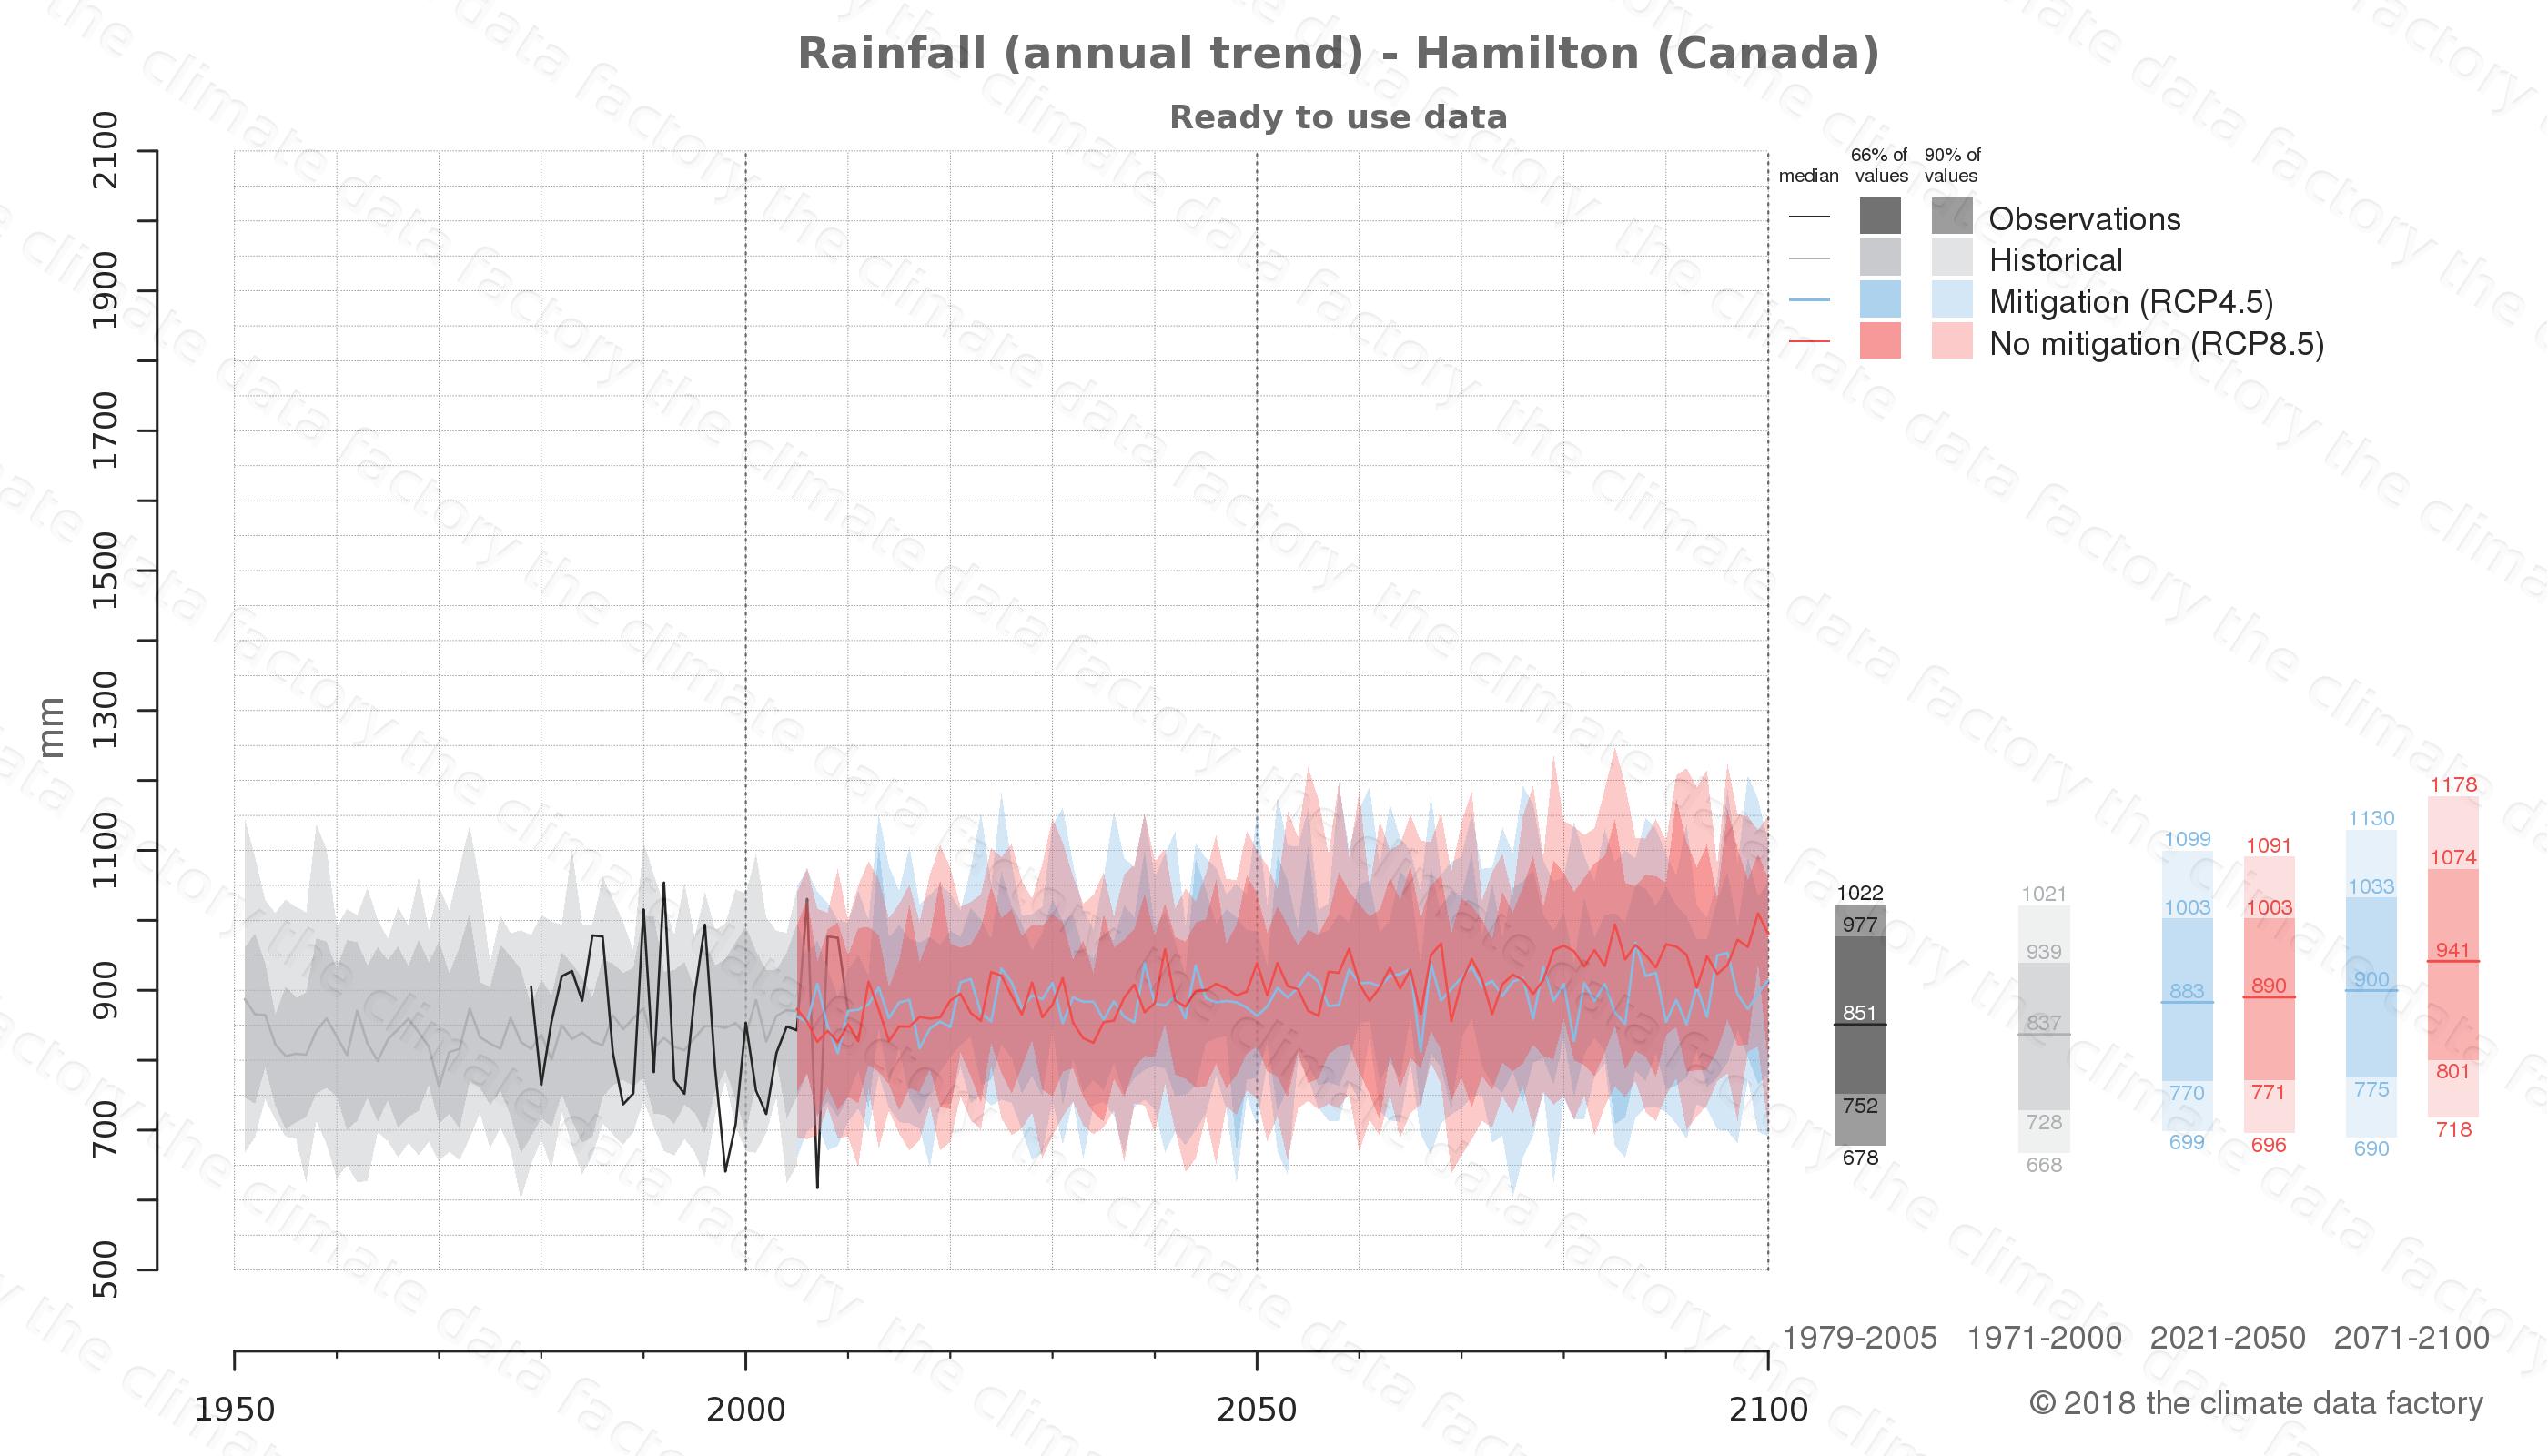 climate change data policy adaptation climate graph city data rainfall hamilton canada